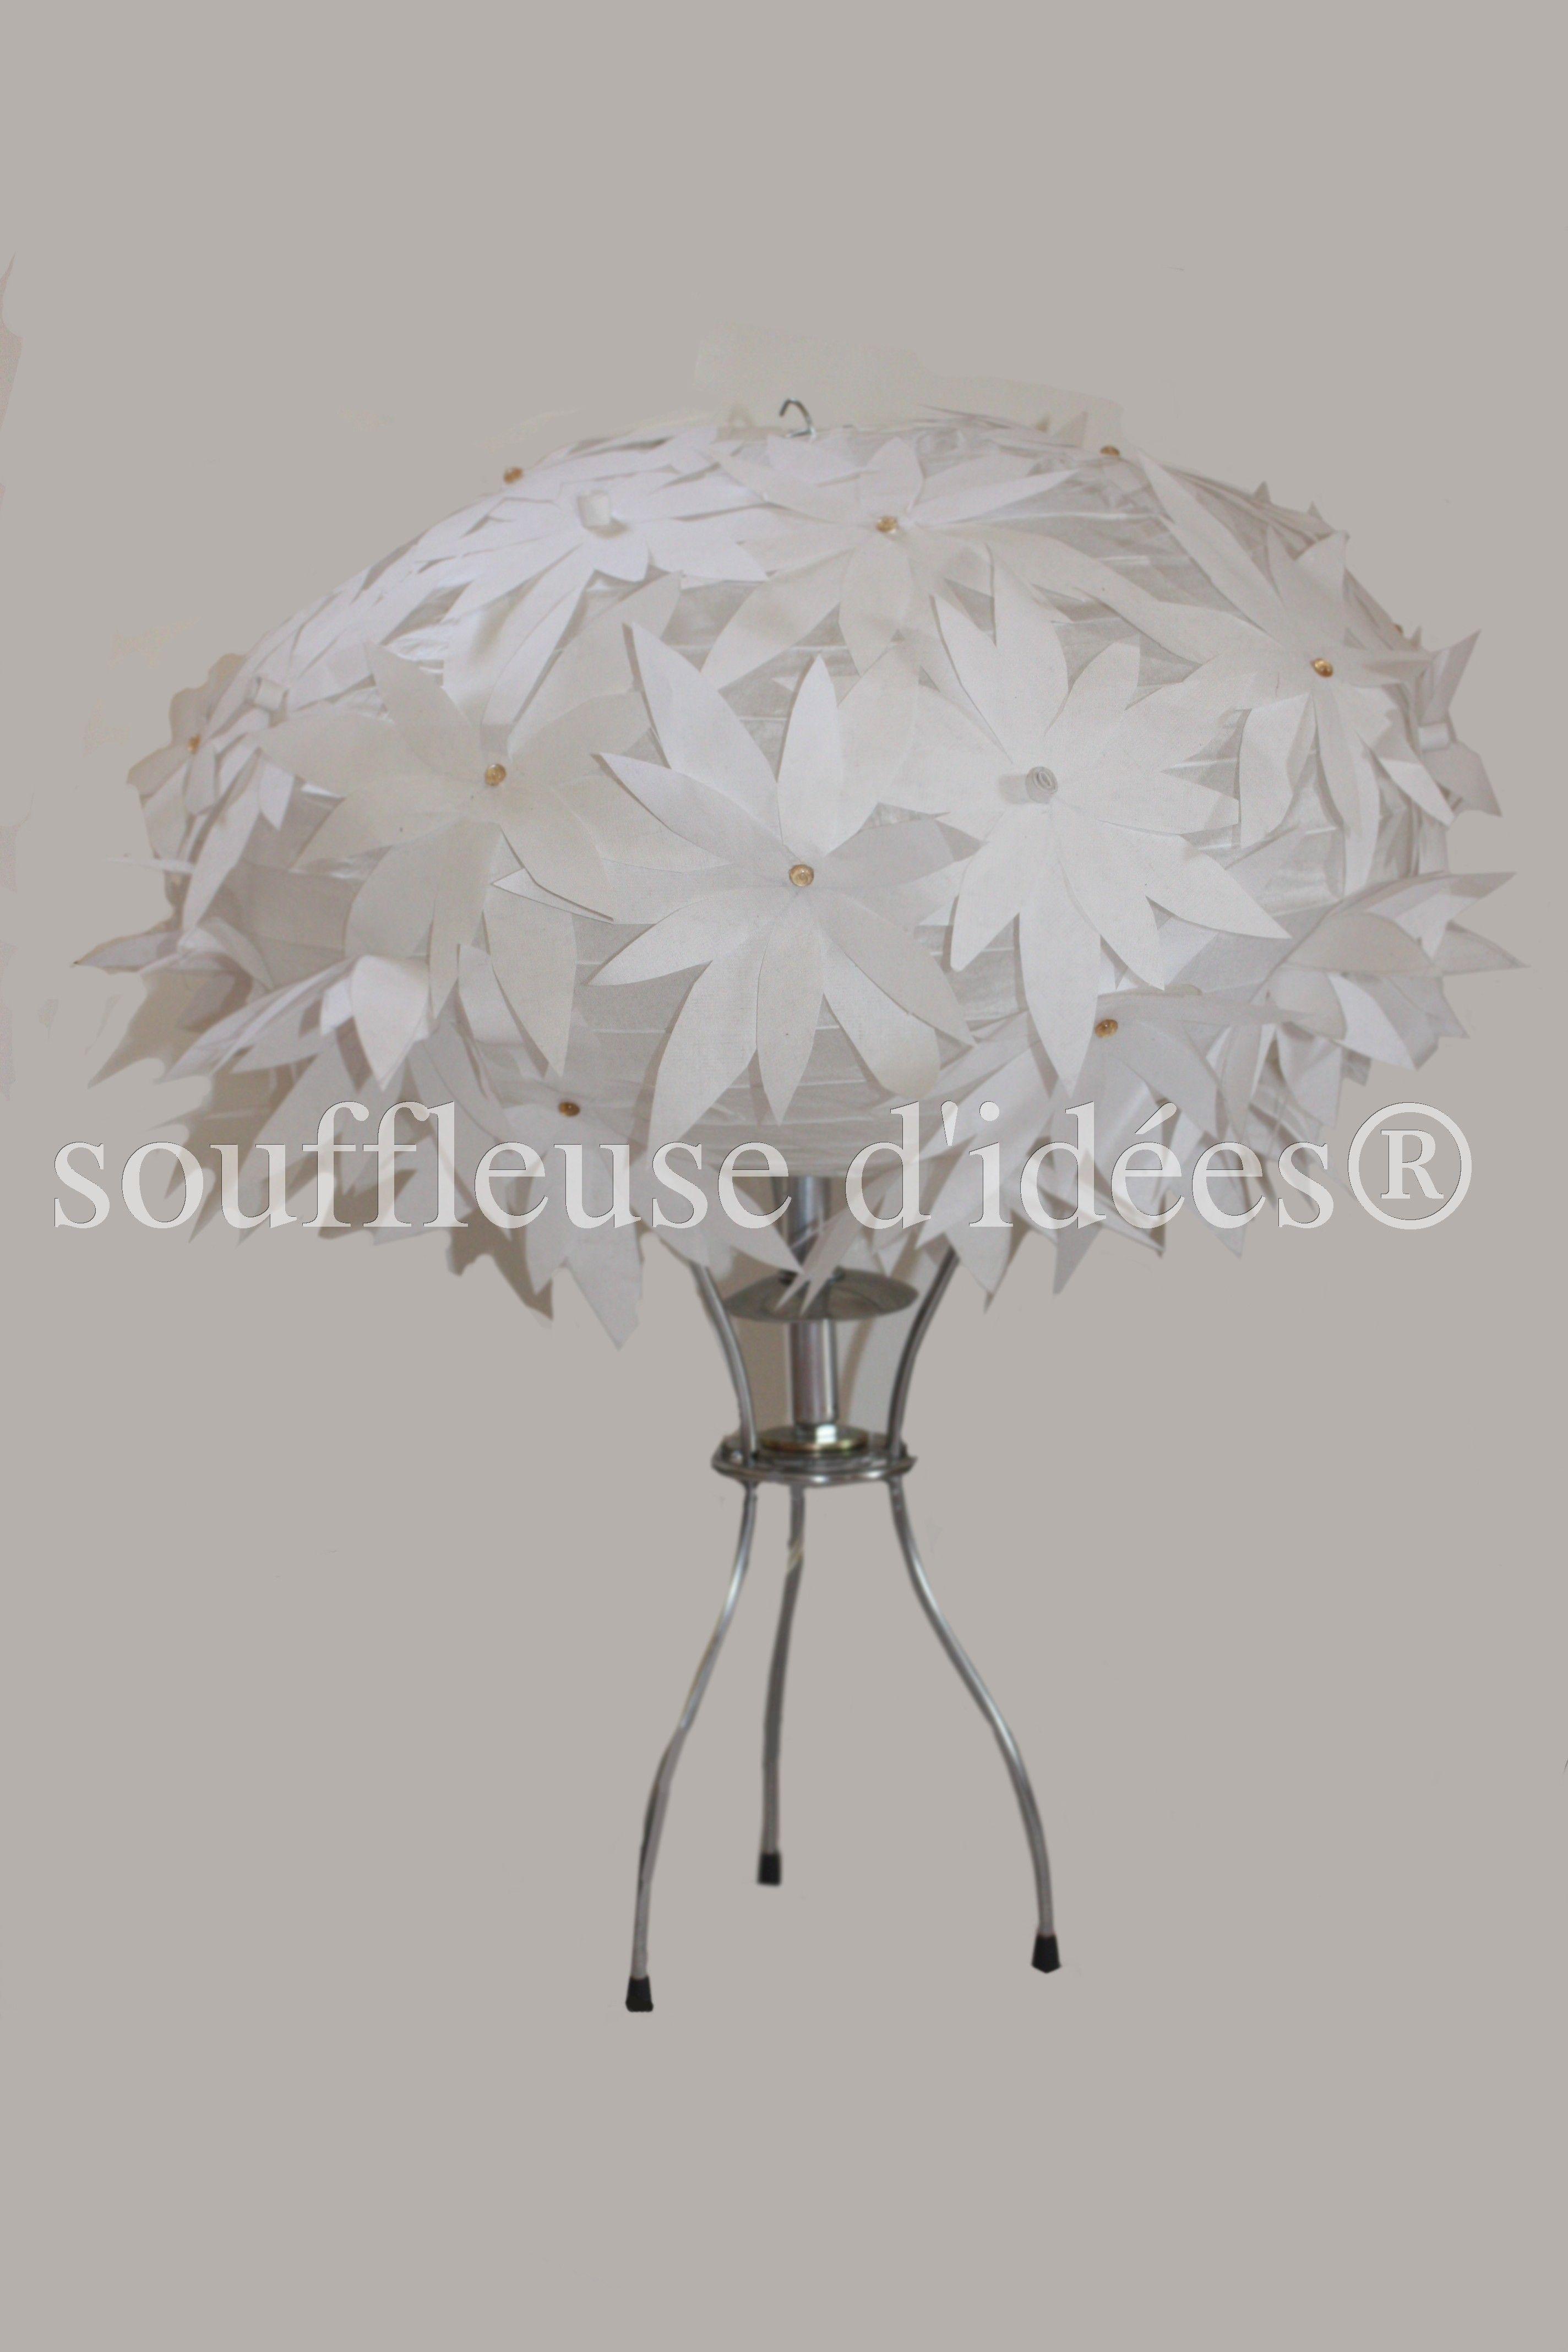 Lampe Fleur De Souffleuse D Idees Creations Souffleuse D Idees